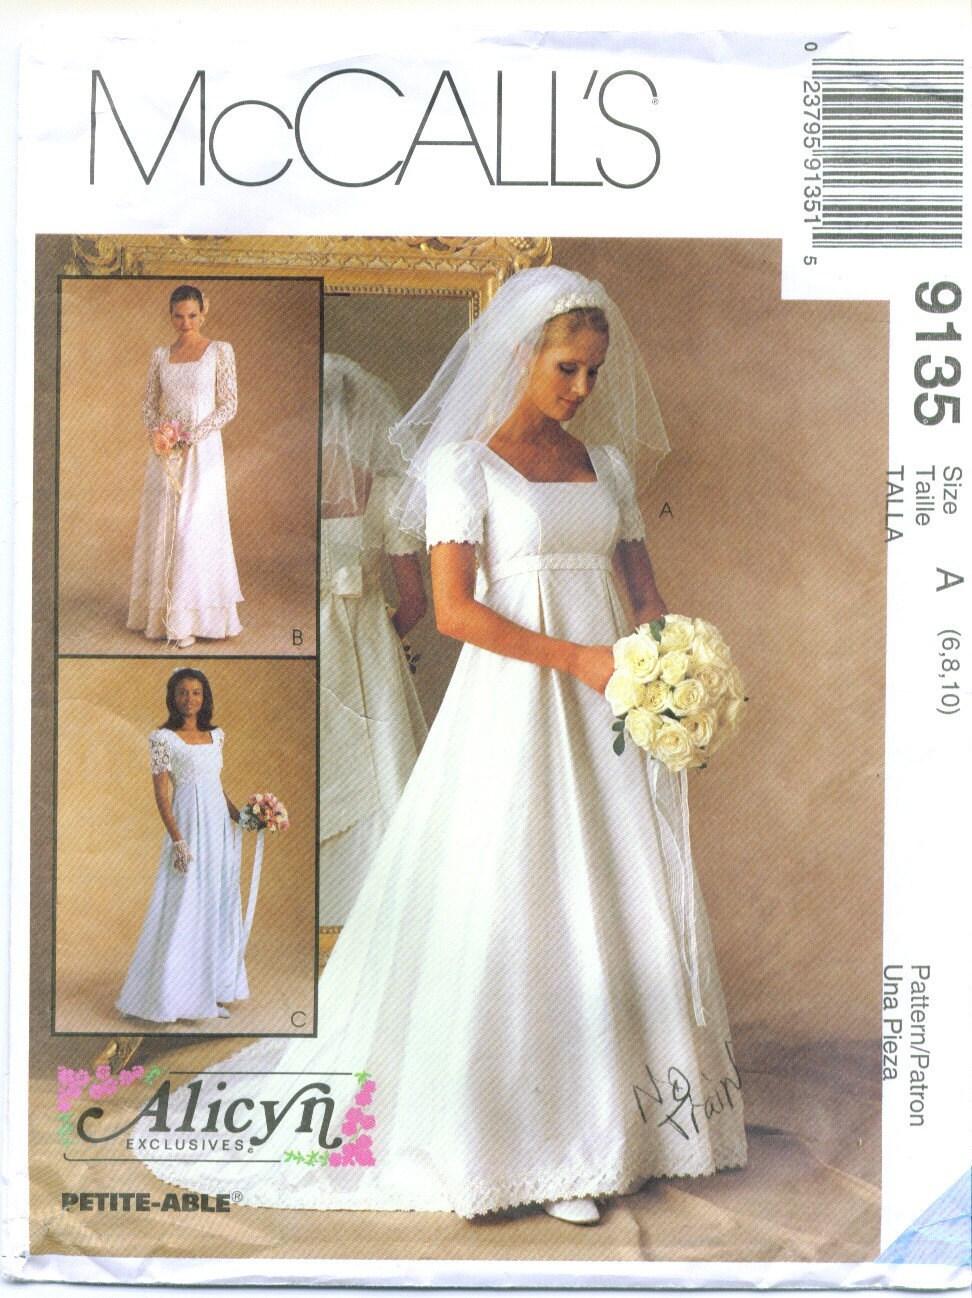 Mccall 39 s 9135 alicyn wedding dress sewing pattern size 6 8 for Wedding dress sewing patterns free